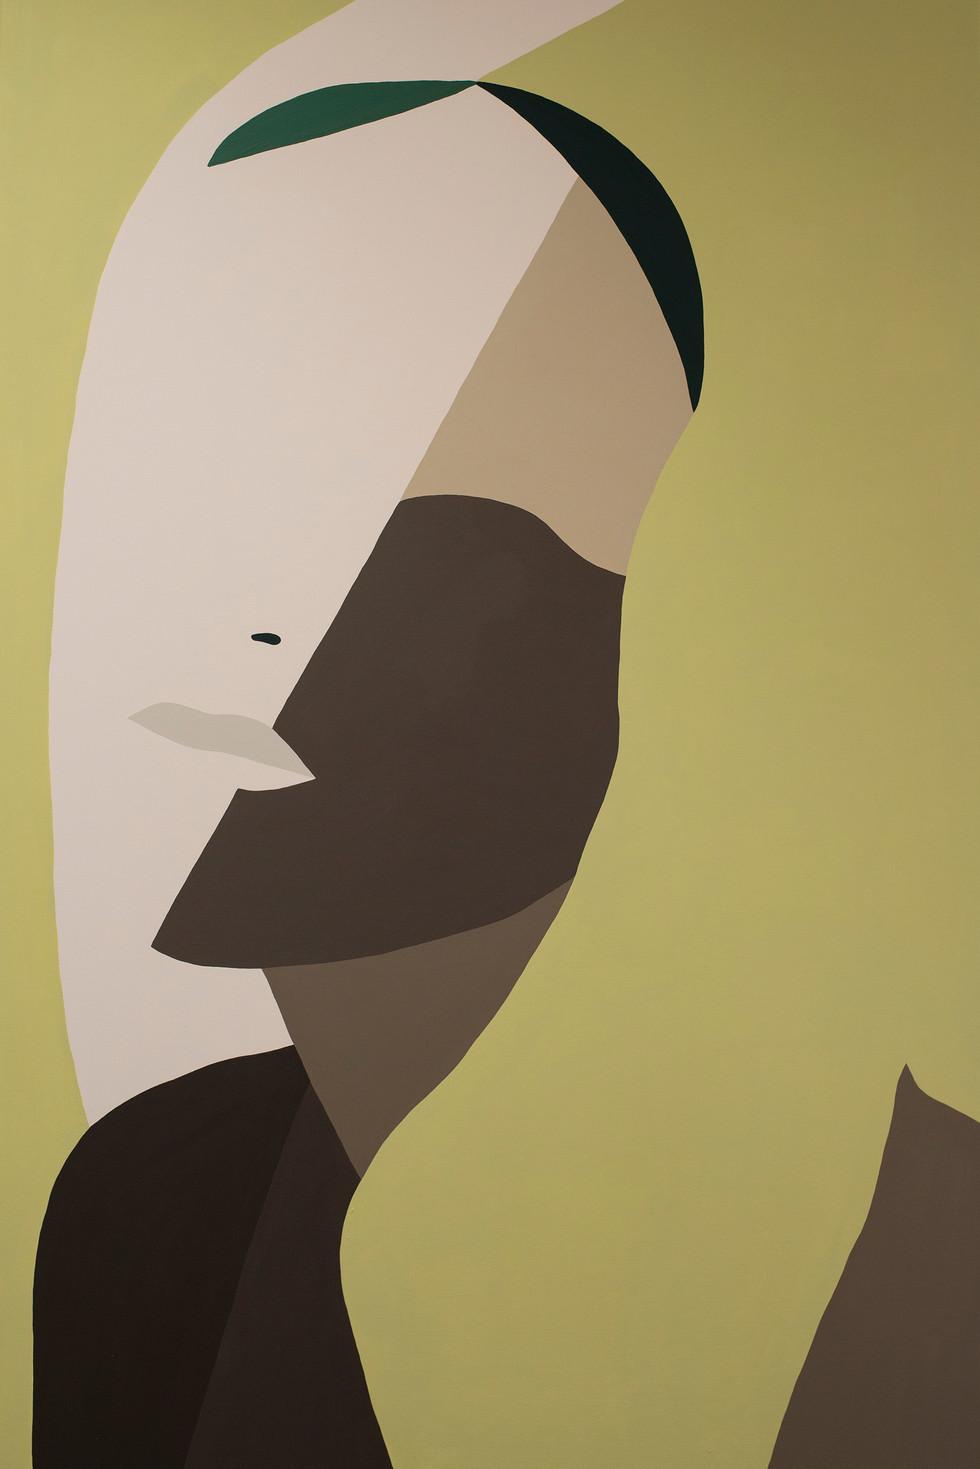 Wide, 2020 acrylic on canvas 80 x 120 cm